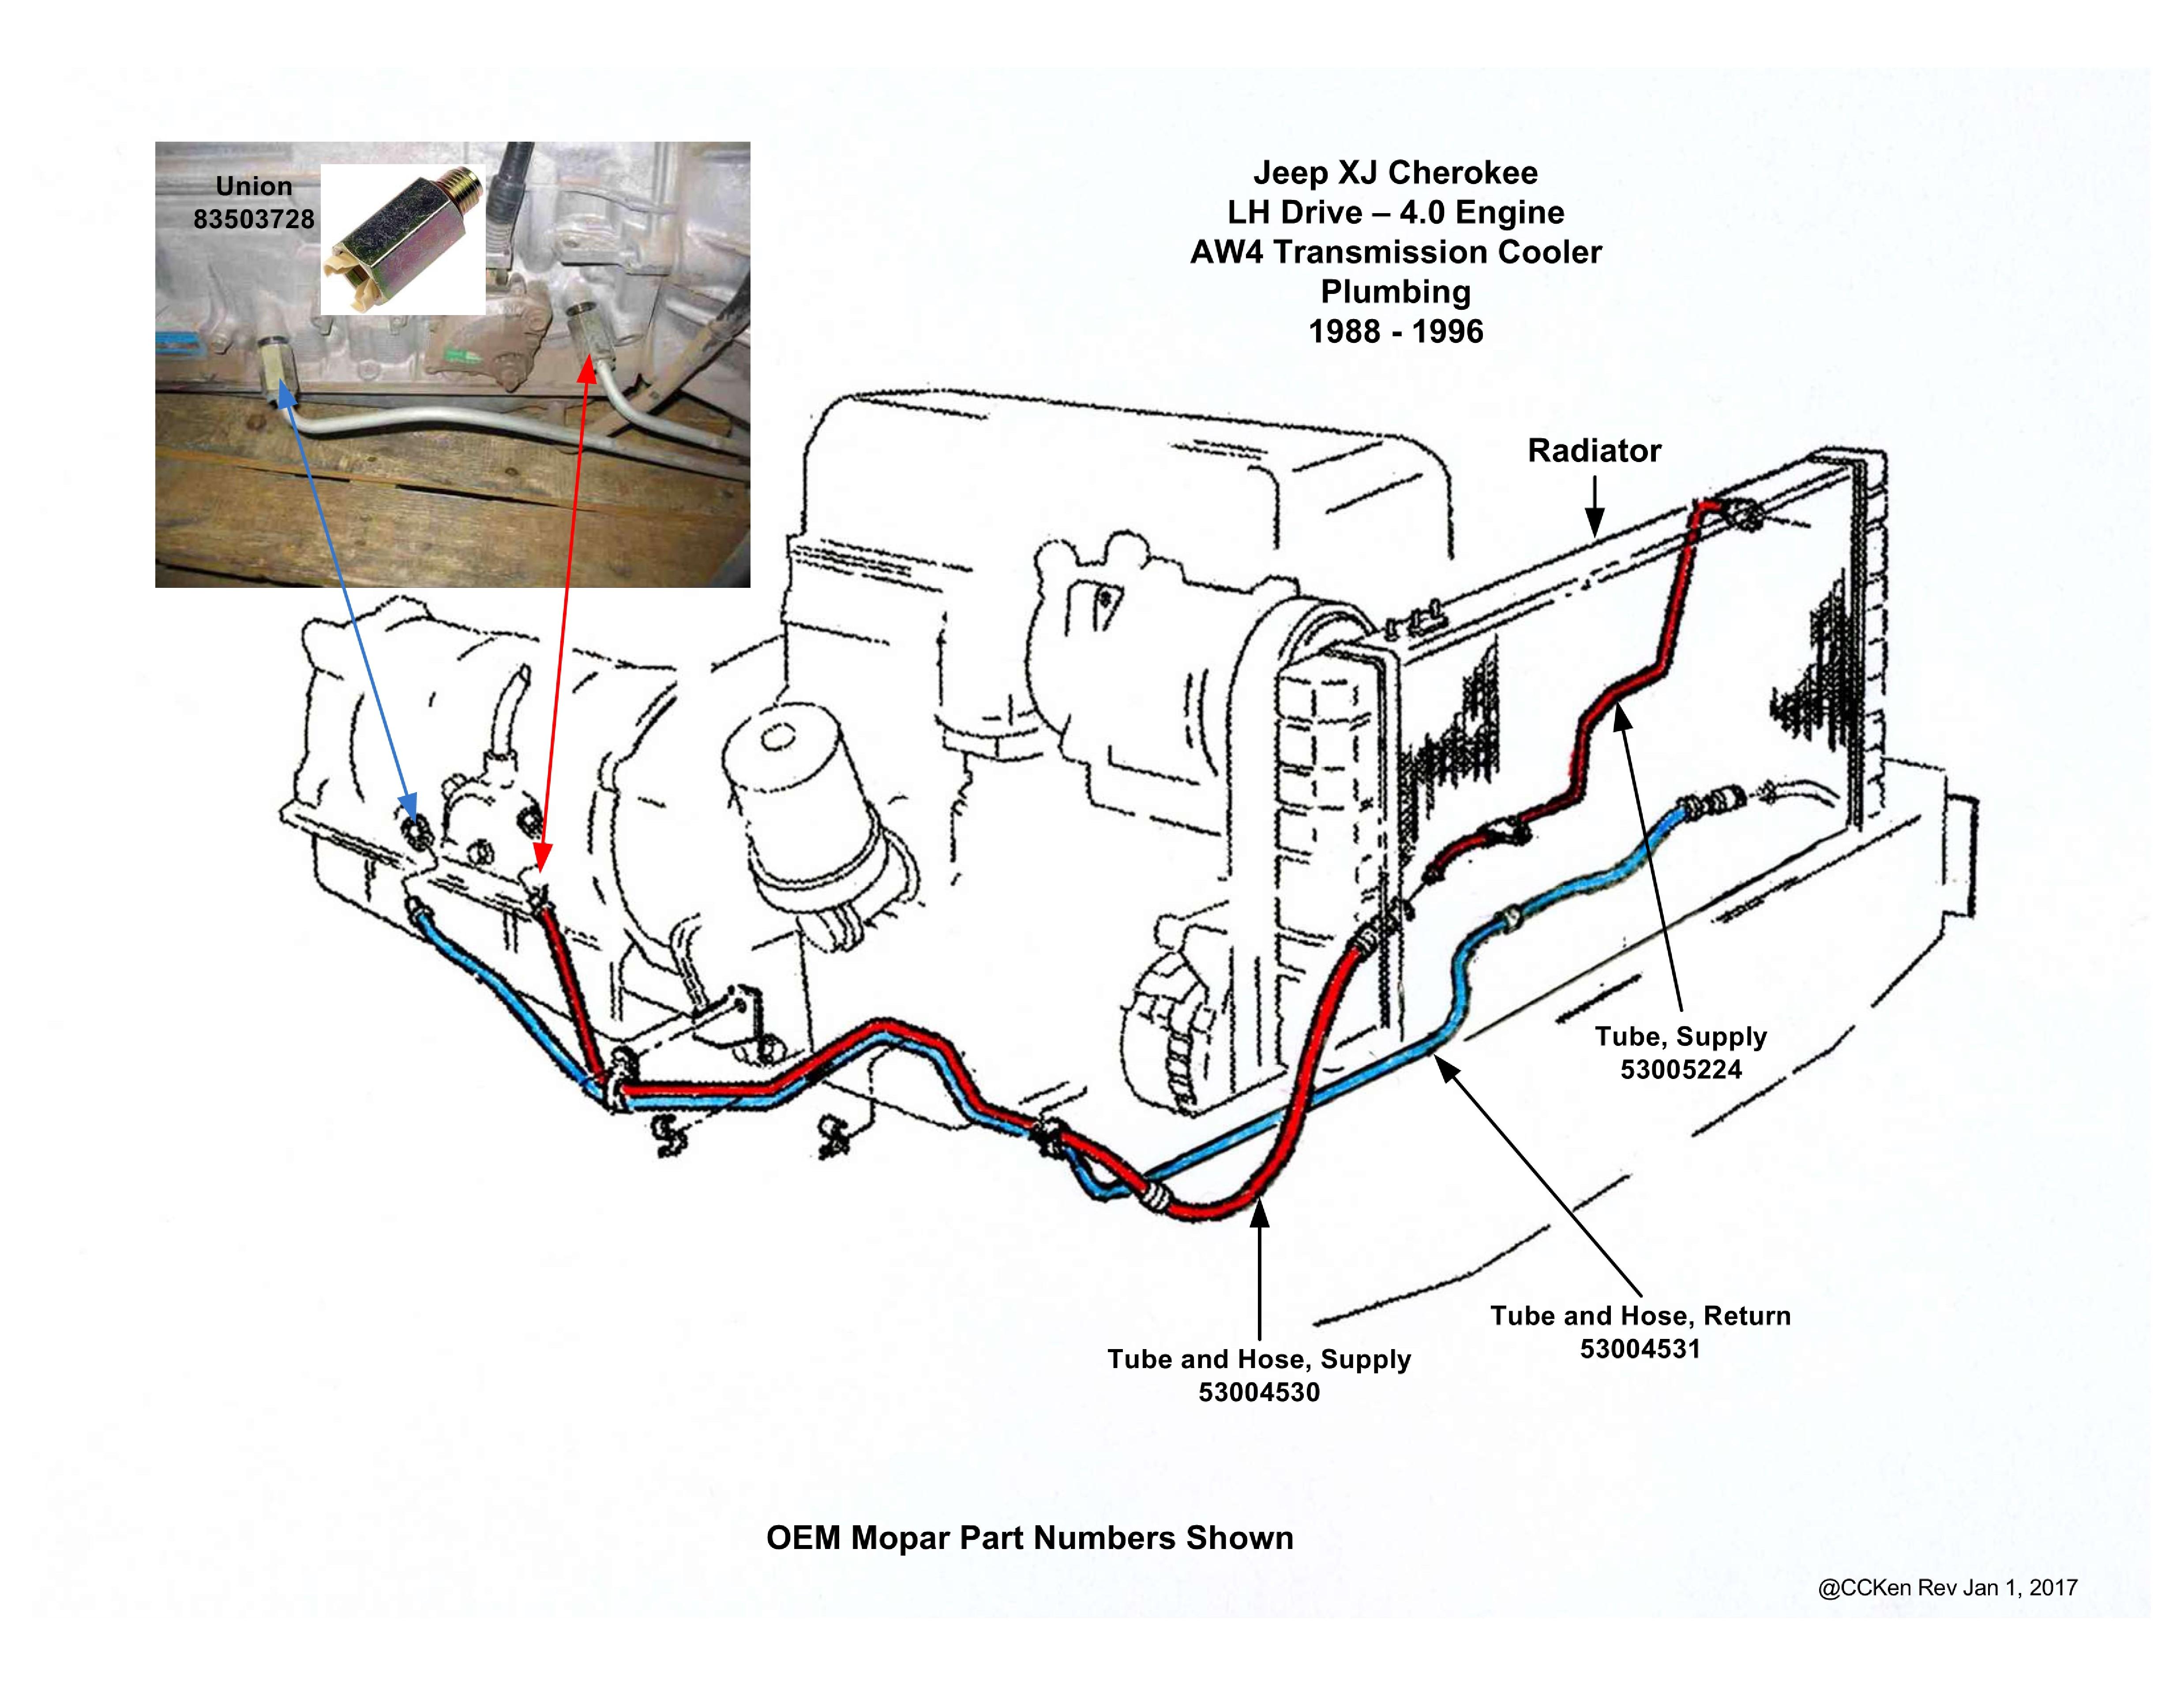 2003 Jeep Cherokee 4.7 Hydraulic Fan Wiring Diagram Zg 7065] Jeep Cherokee Cooling System Parts 87 Jeep Of 2003 Jeep Cherokee 4.7 Hydraulic Fan Wiring Diagram